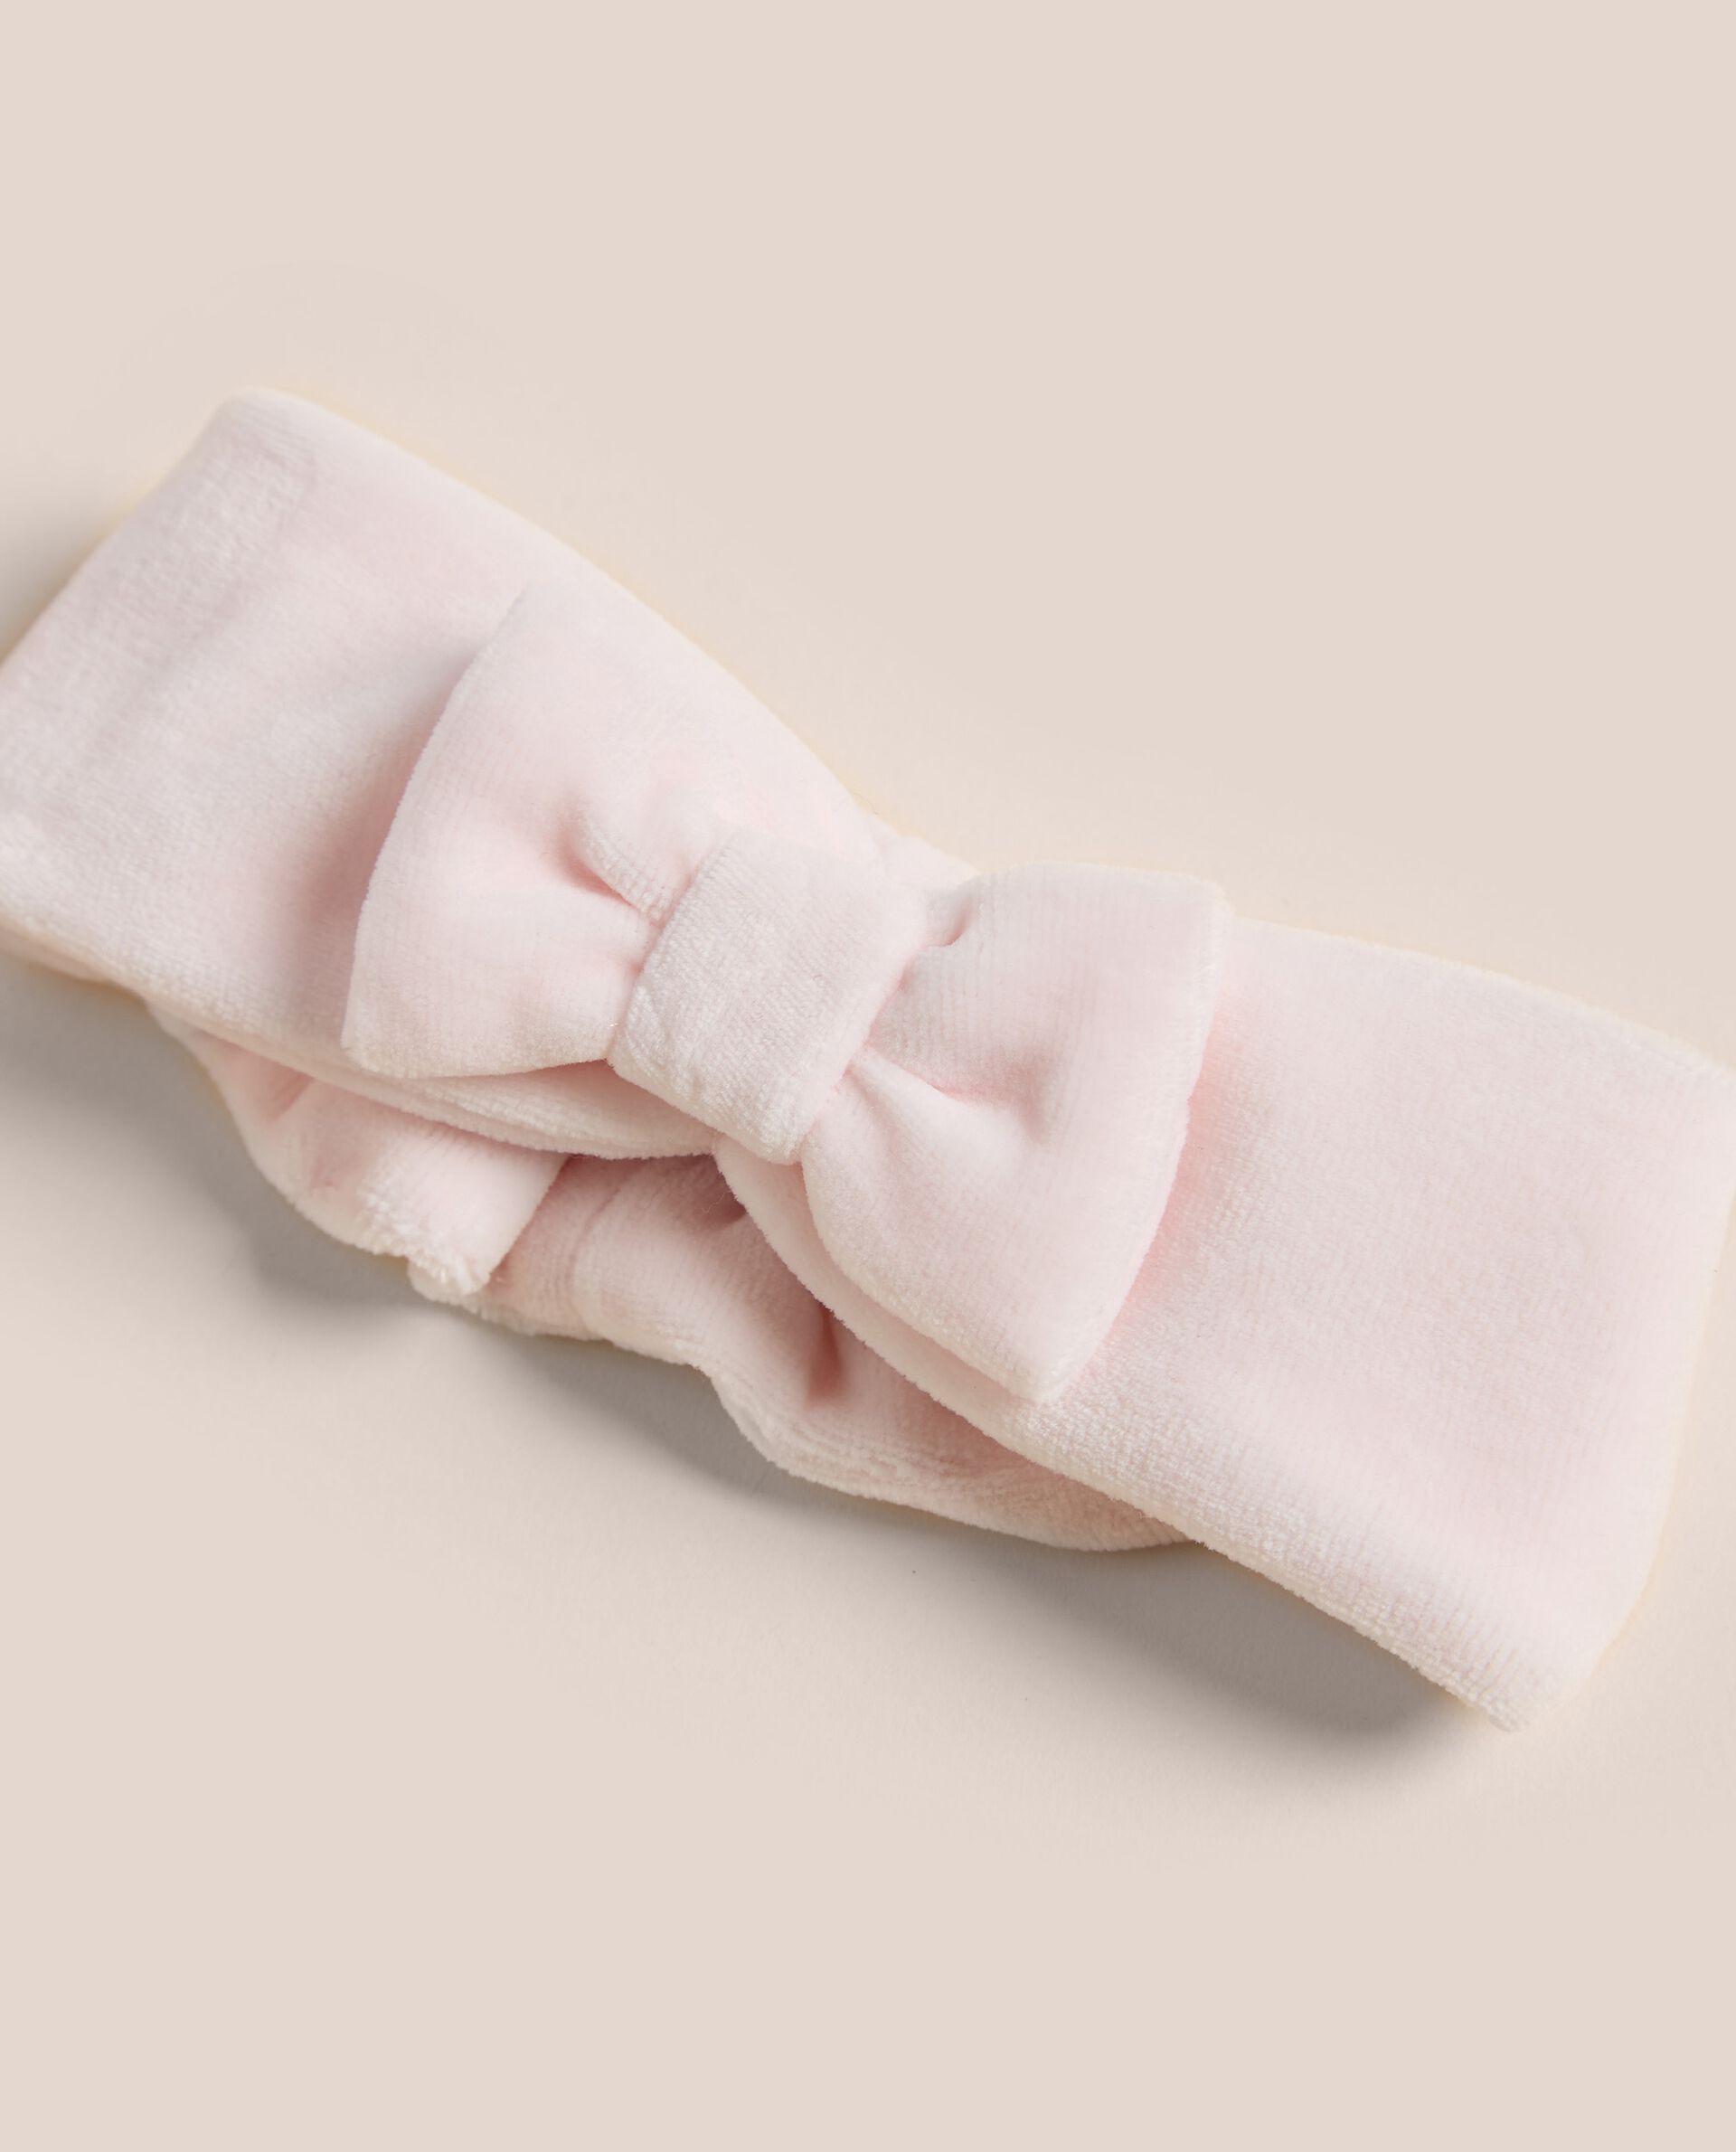 Fascetta in cotone stretch IANA Made in Italy